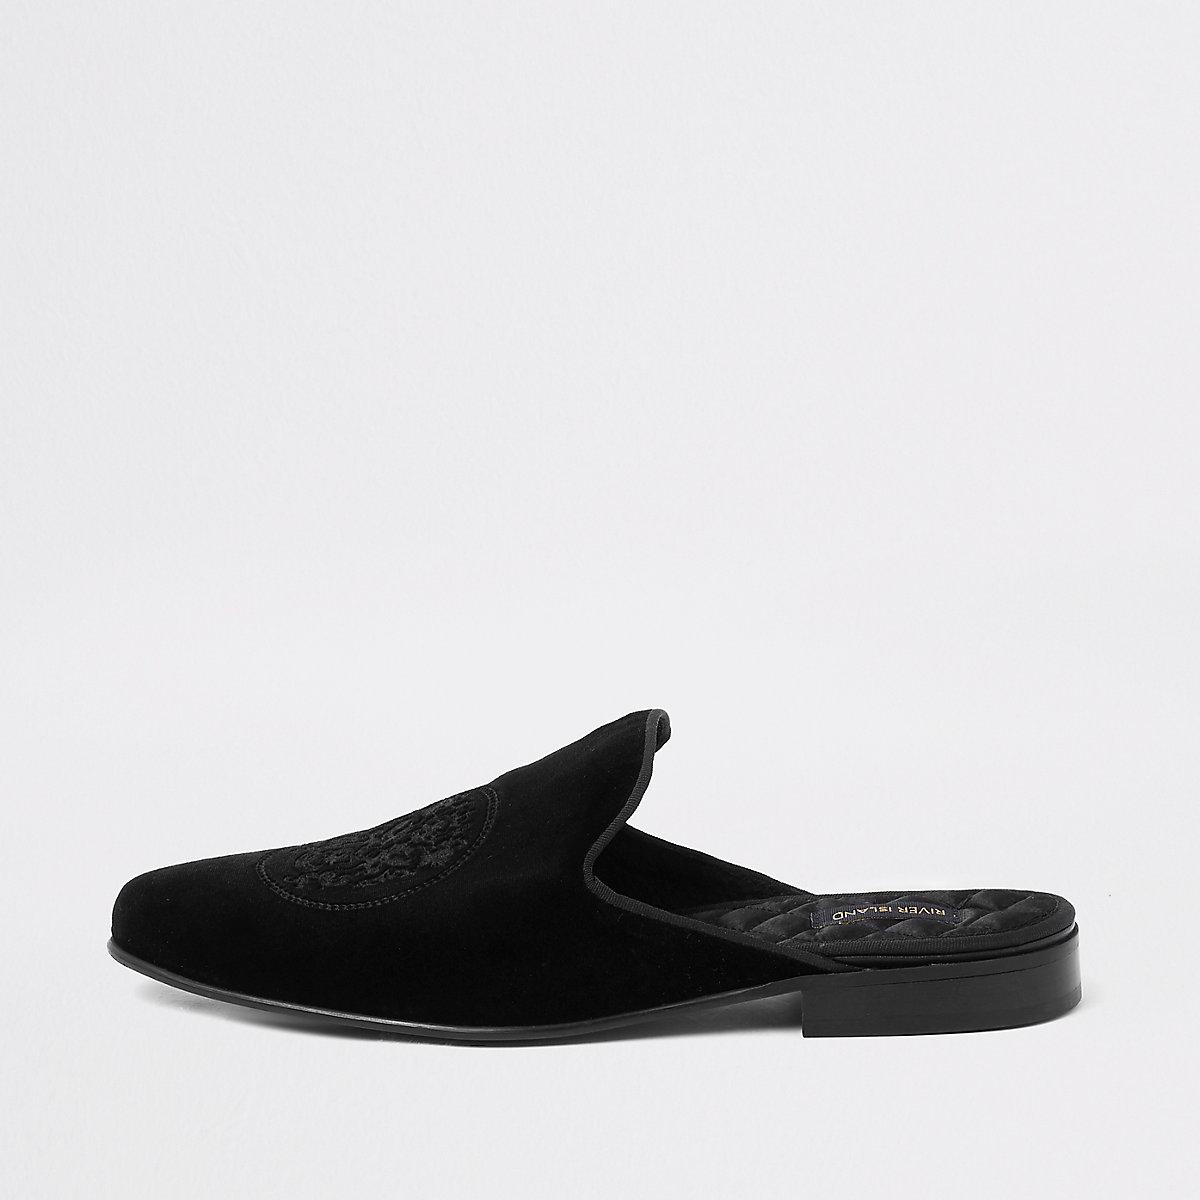 Black embroidered velvet backless loafer